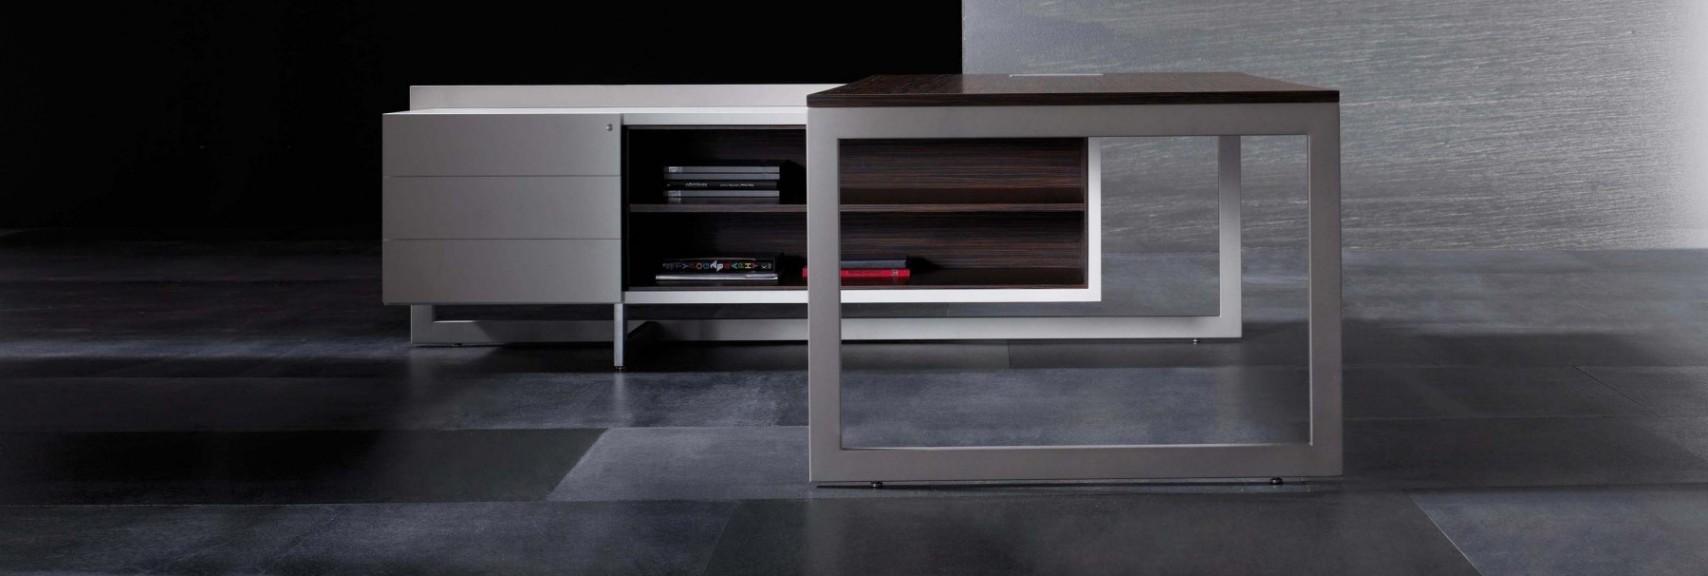 Muebles de oficina asturias idea creativa della casa e for Muebles de oficina gijon